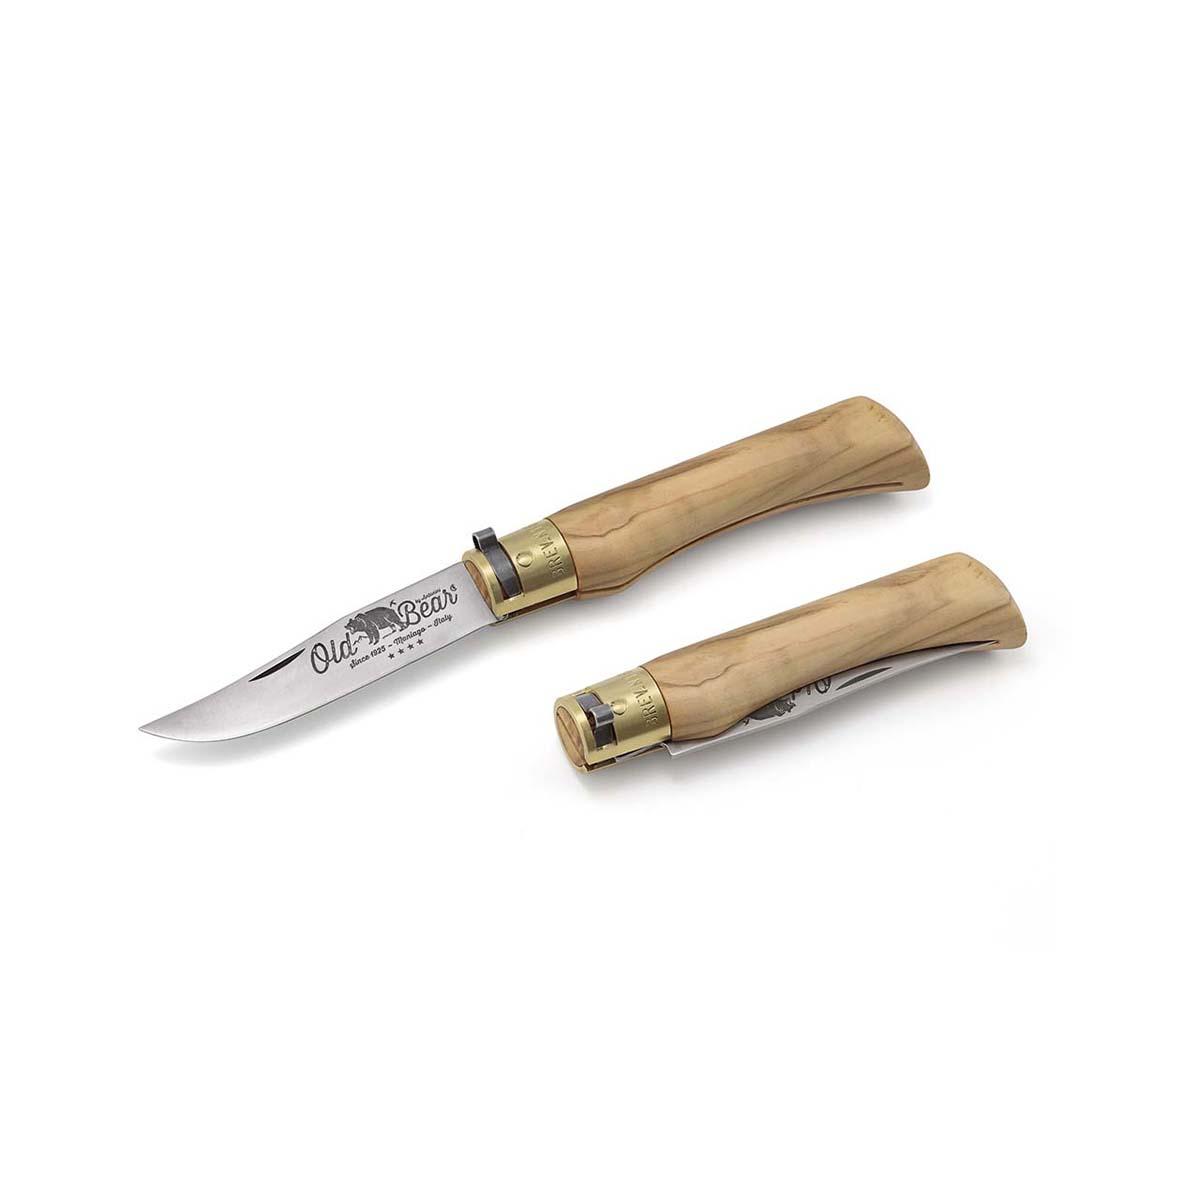 Нож складной Old Bear Antonini 9307/21_LU Large 9 см